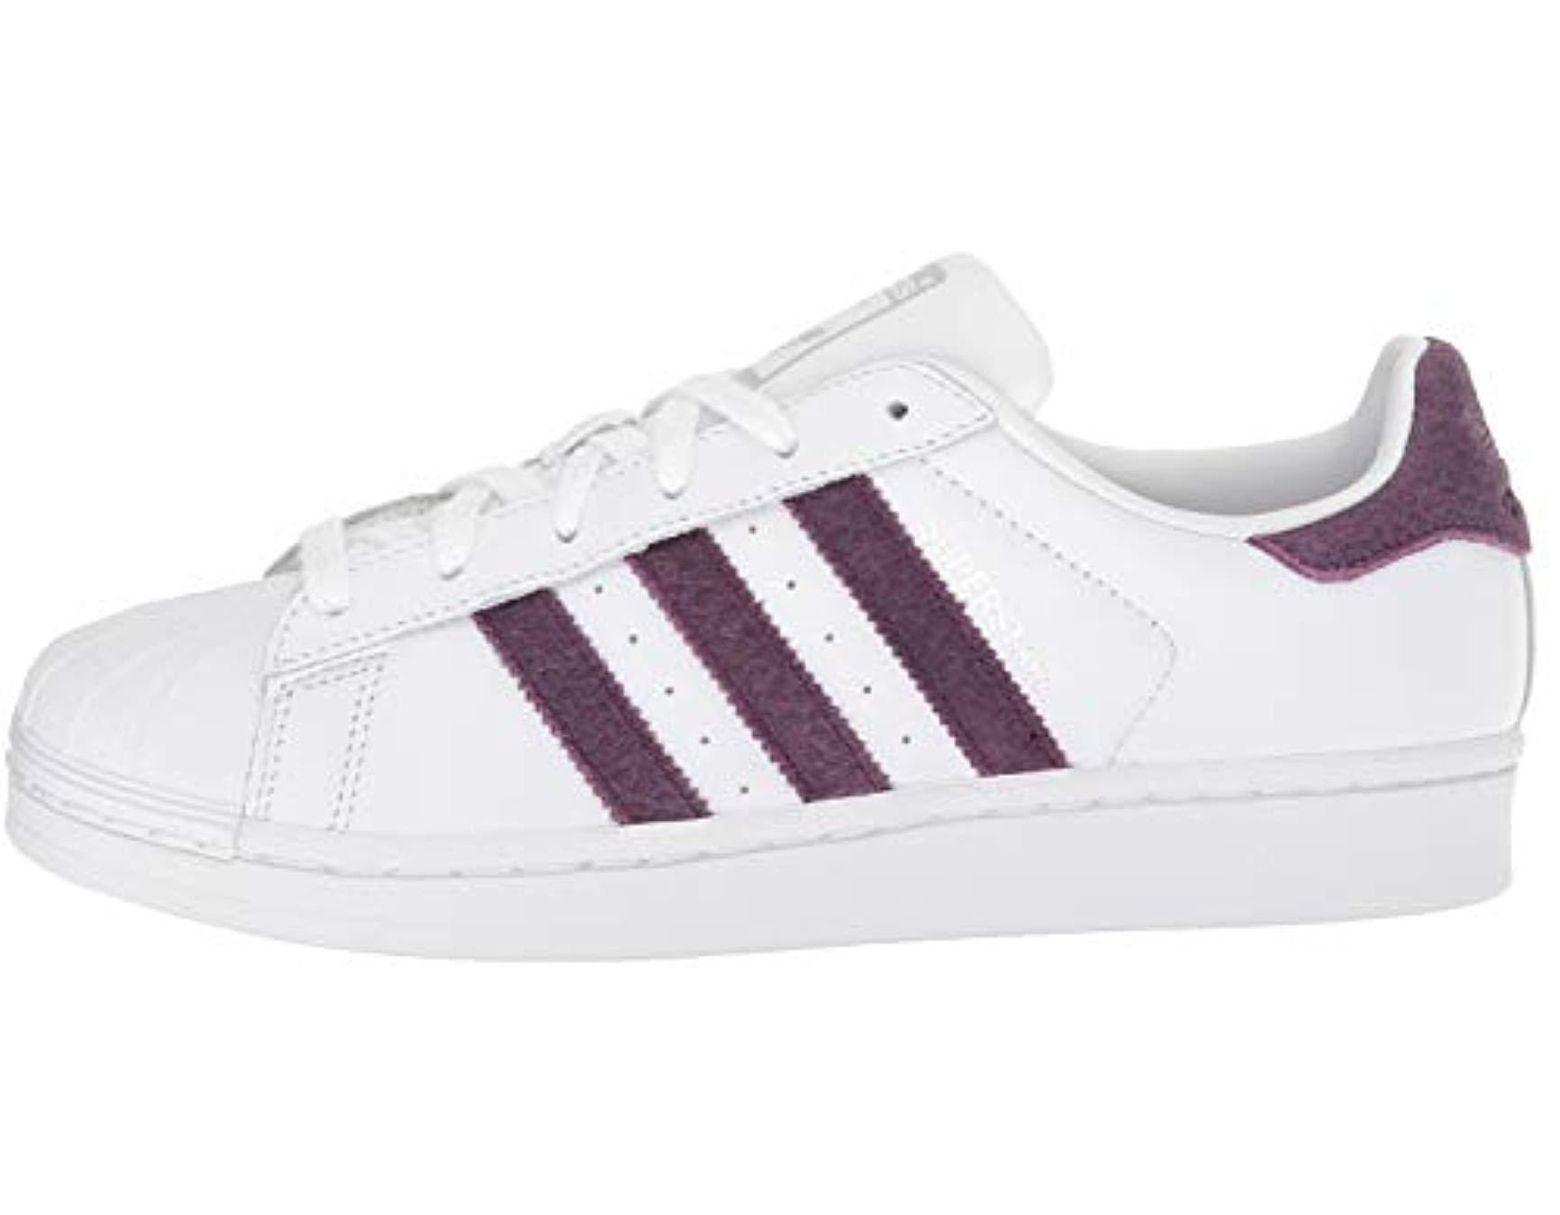 adidas Originals Women's Superstar Shoes Running, Whitered NightSilver Metallic, 9 M US